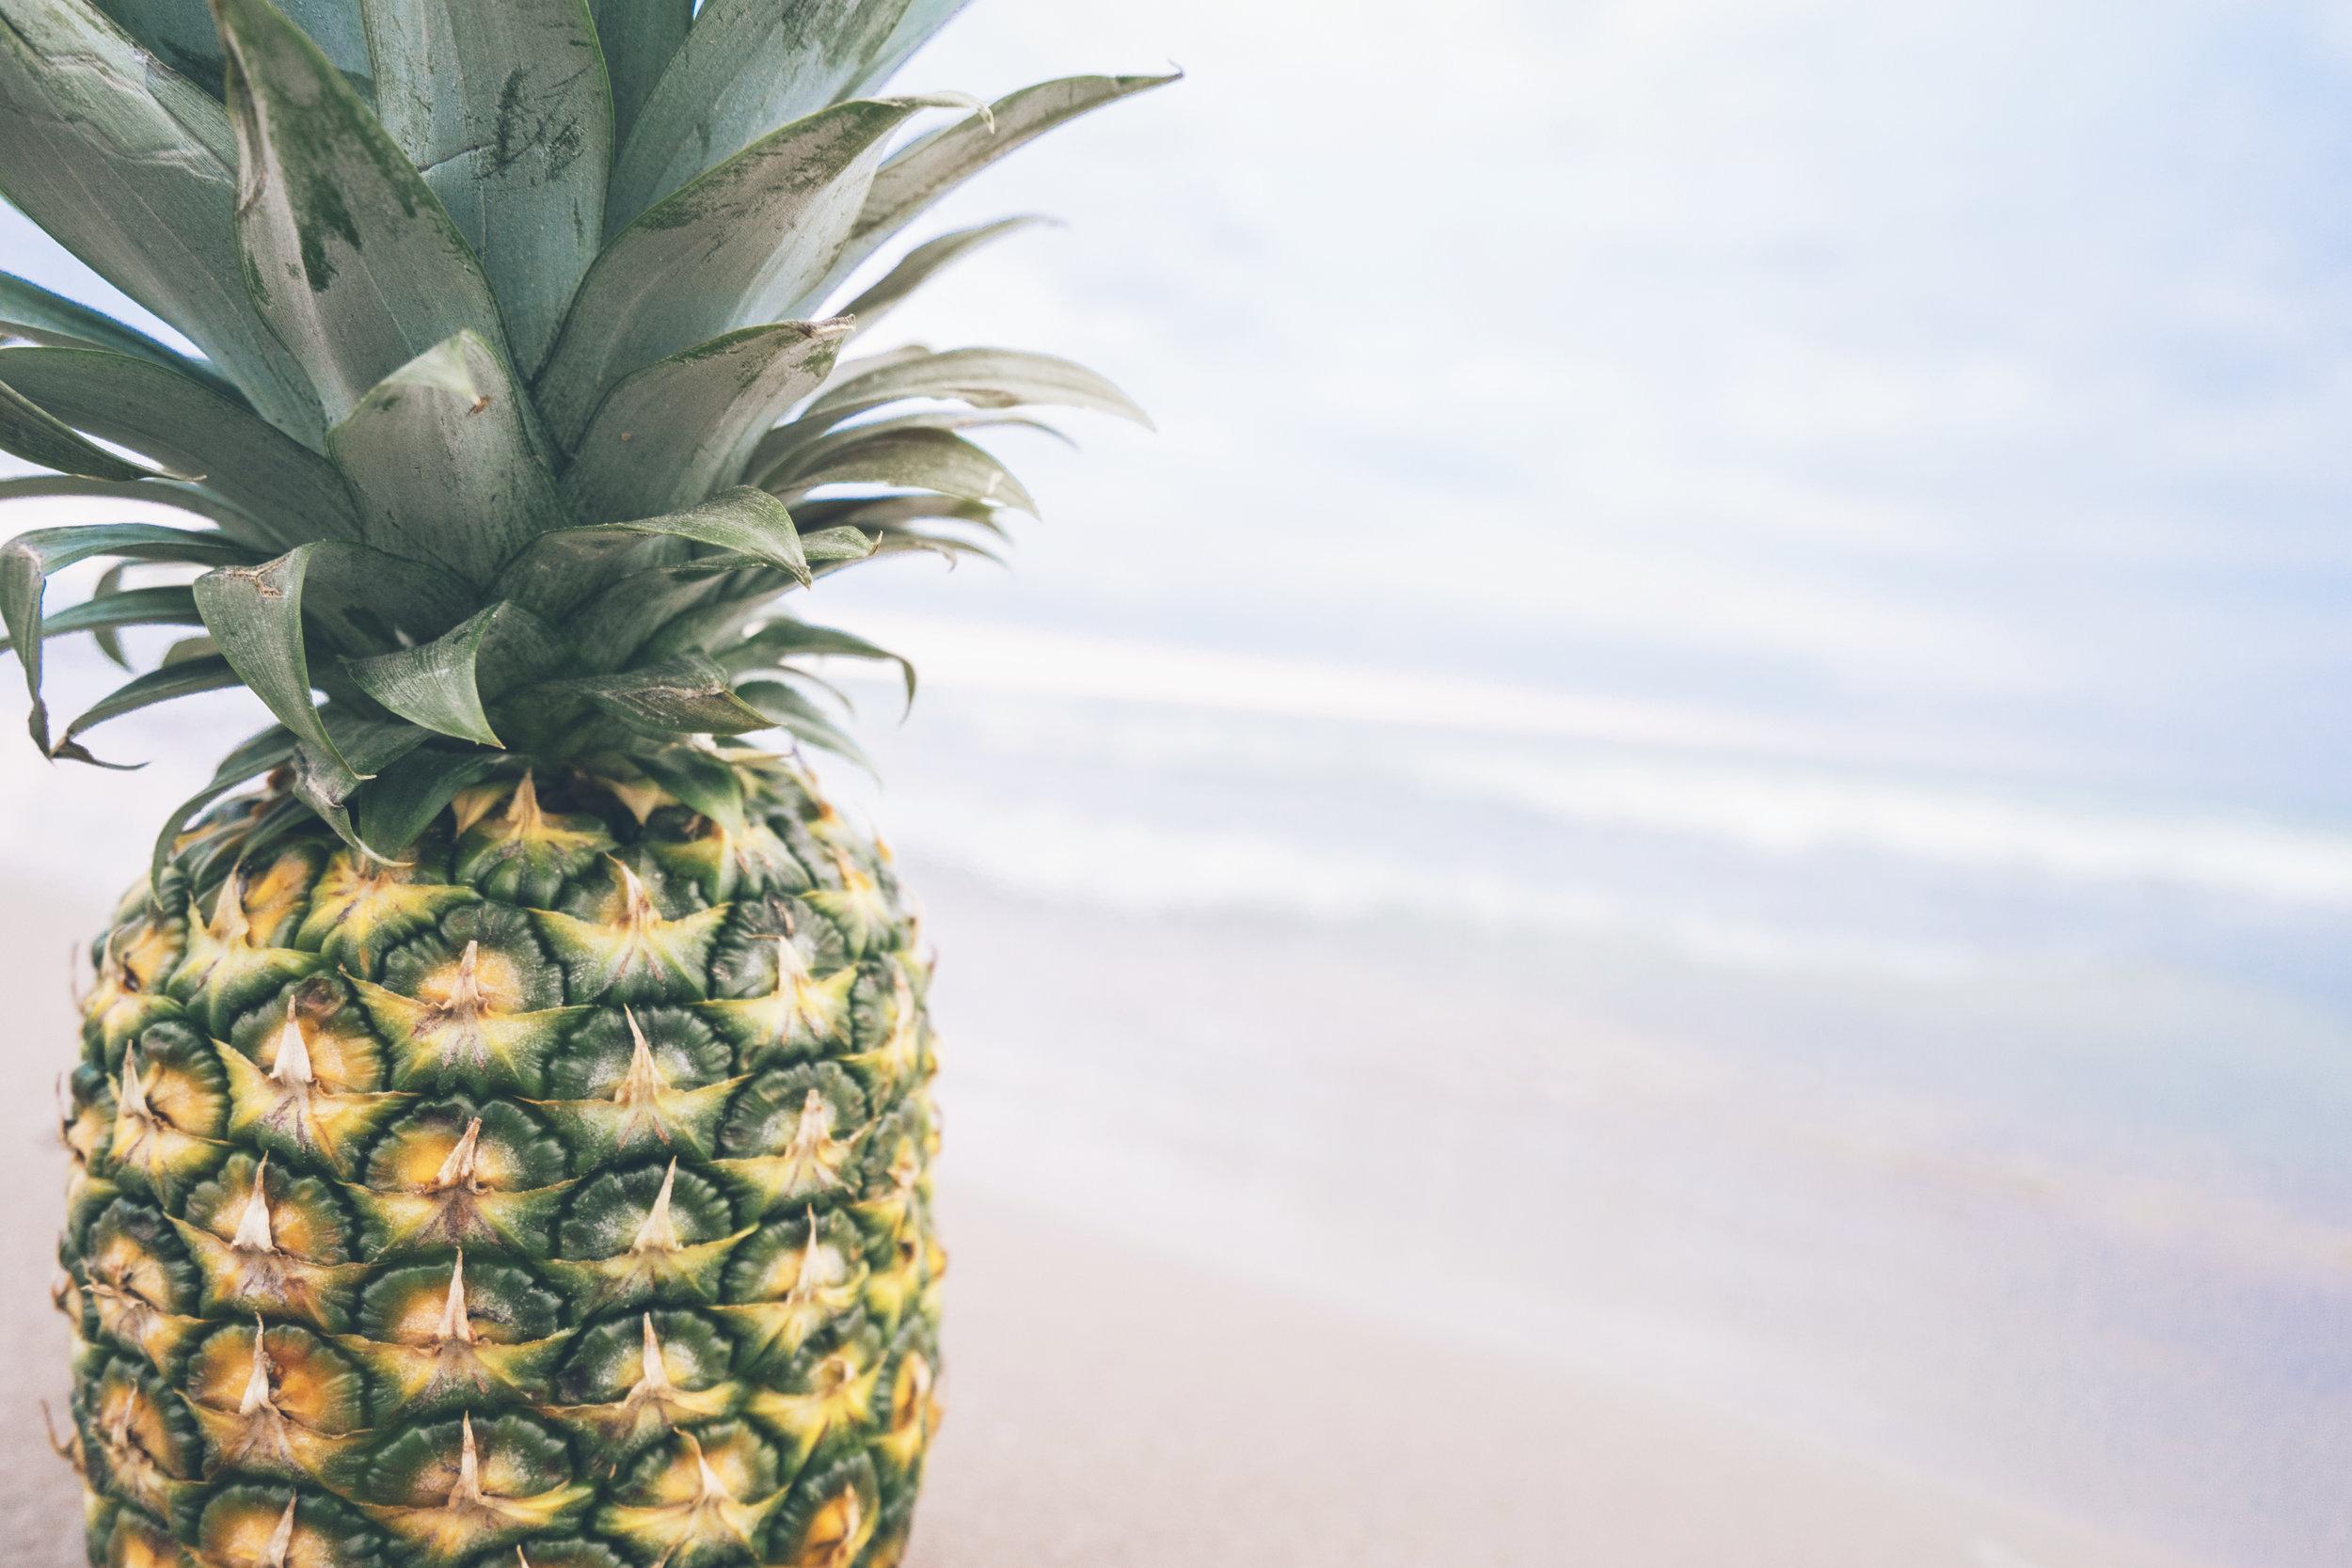 pineapple close up.jpeg